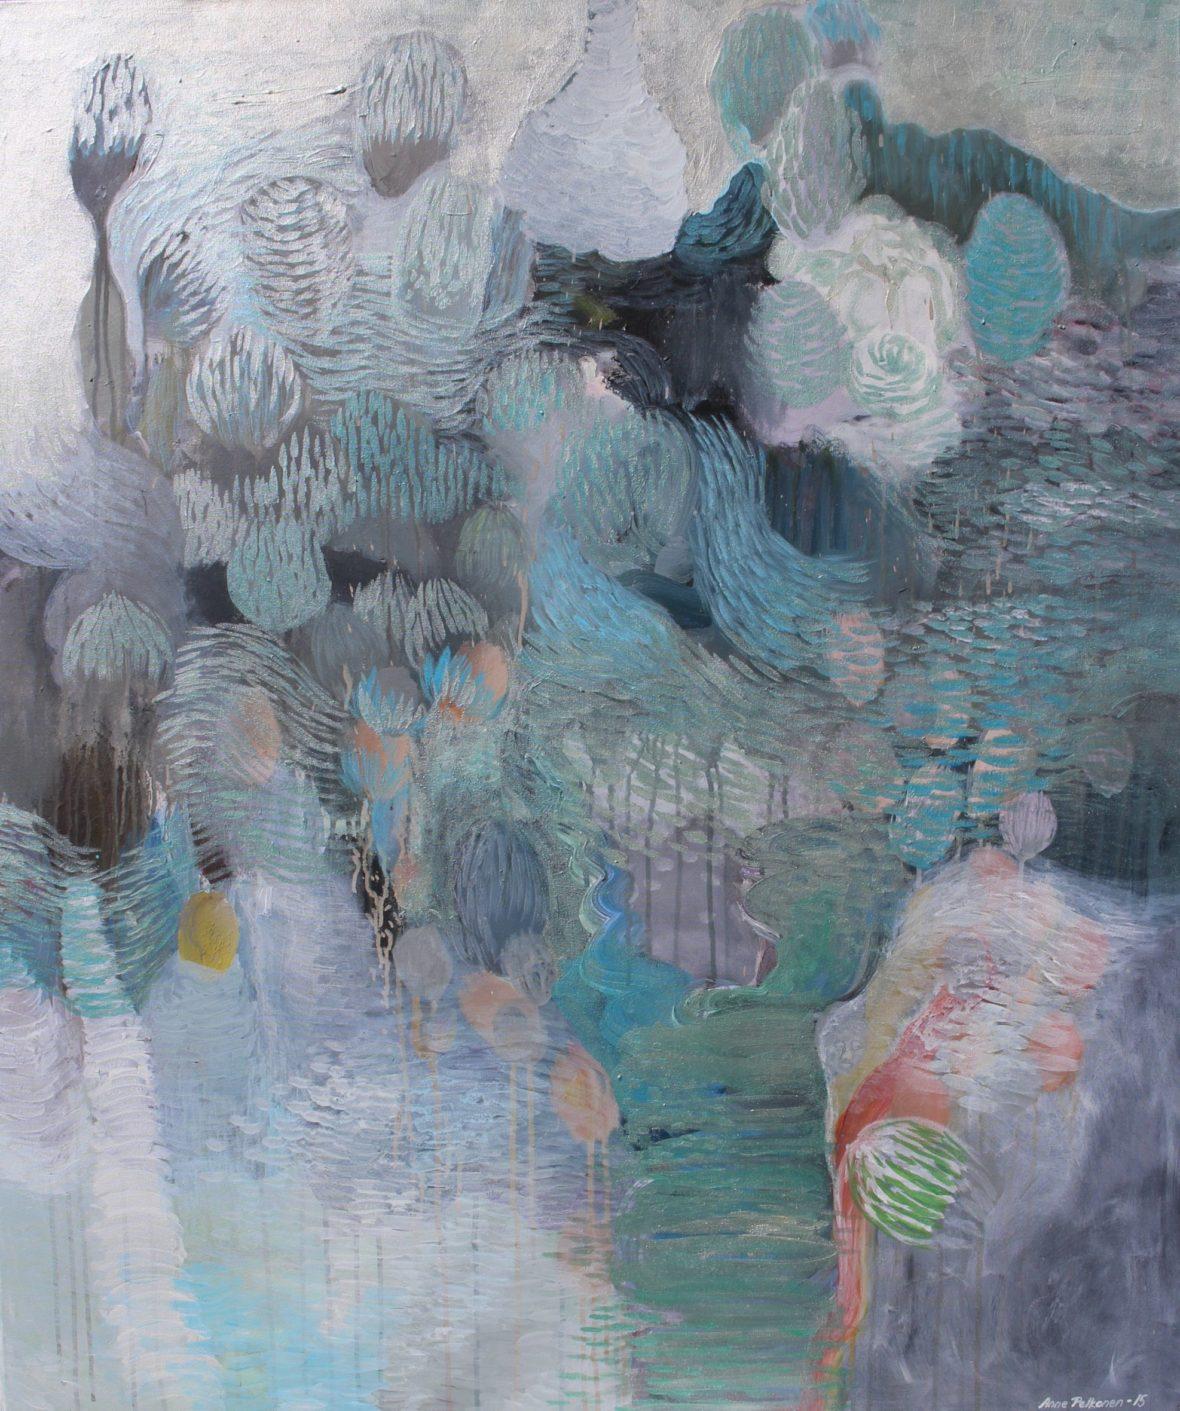 Sarjasta Kaunismaailma 28., akryylimaalaus, 120×100 cm, 2015